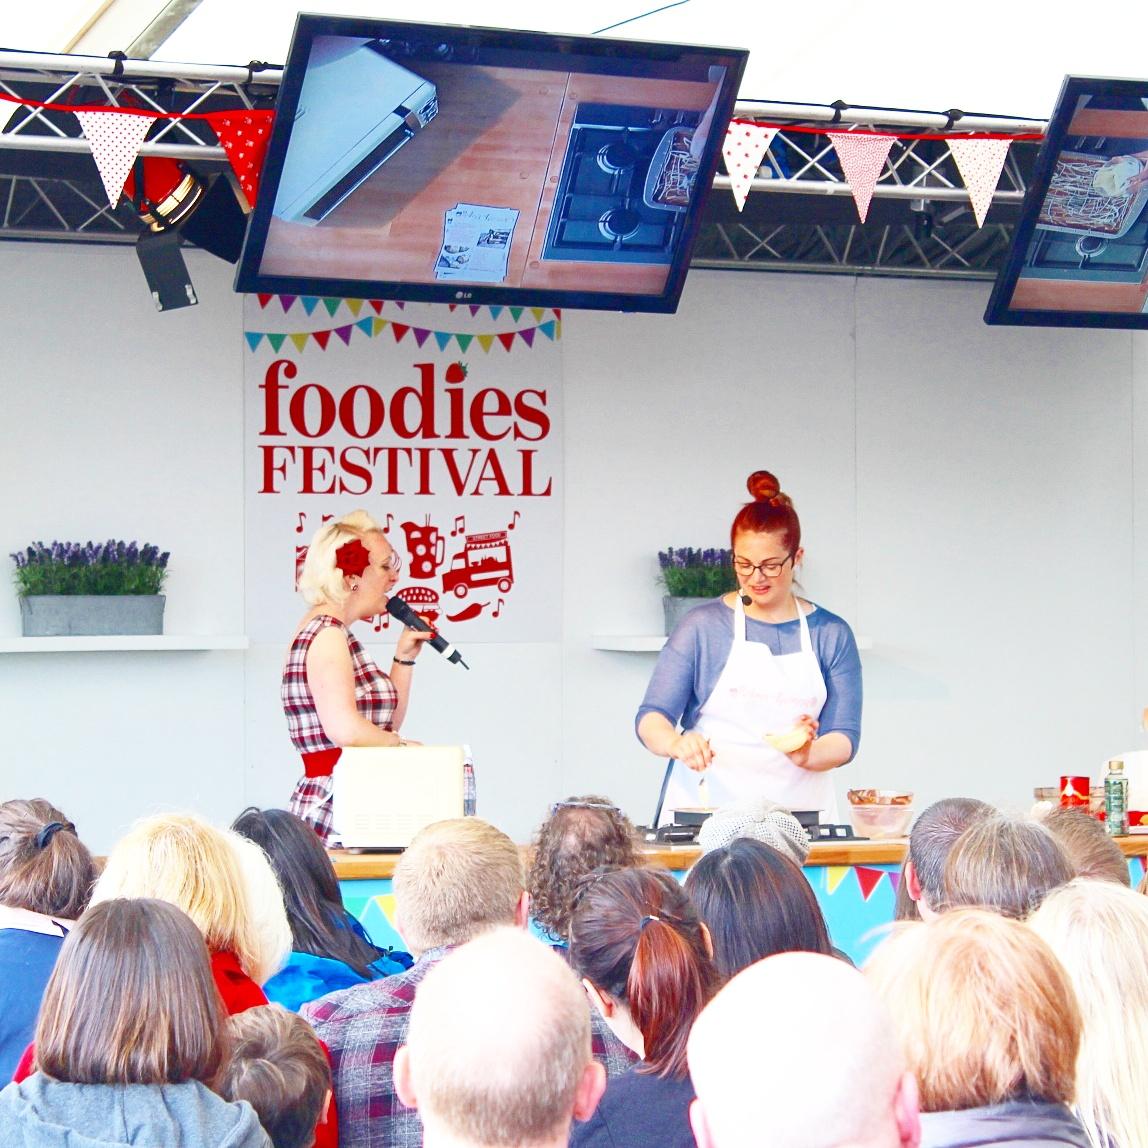 Edinburgh Foodie Festival with Sparkling Ice